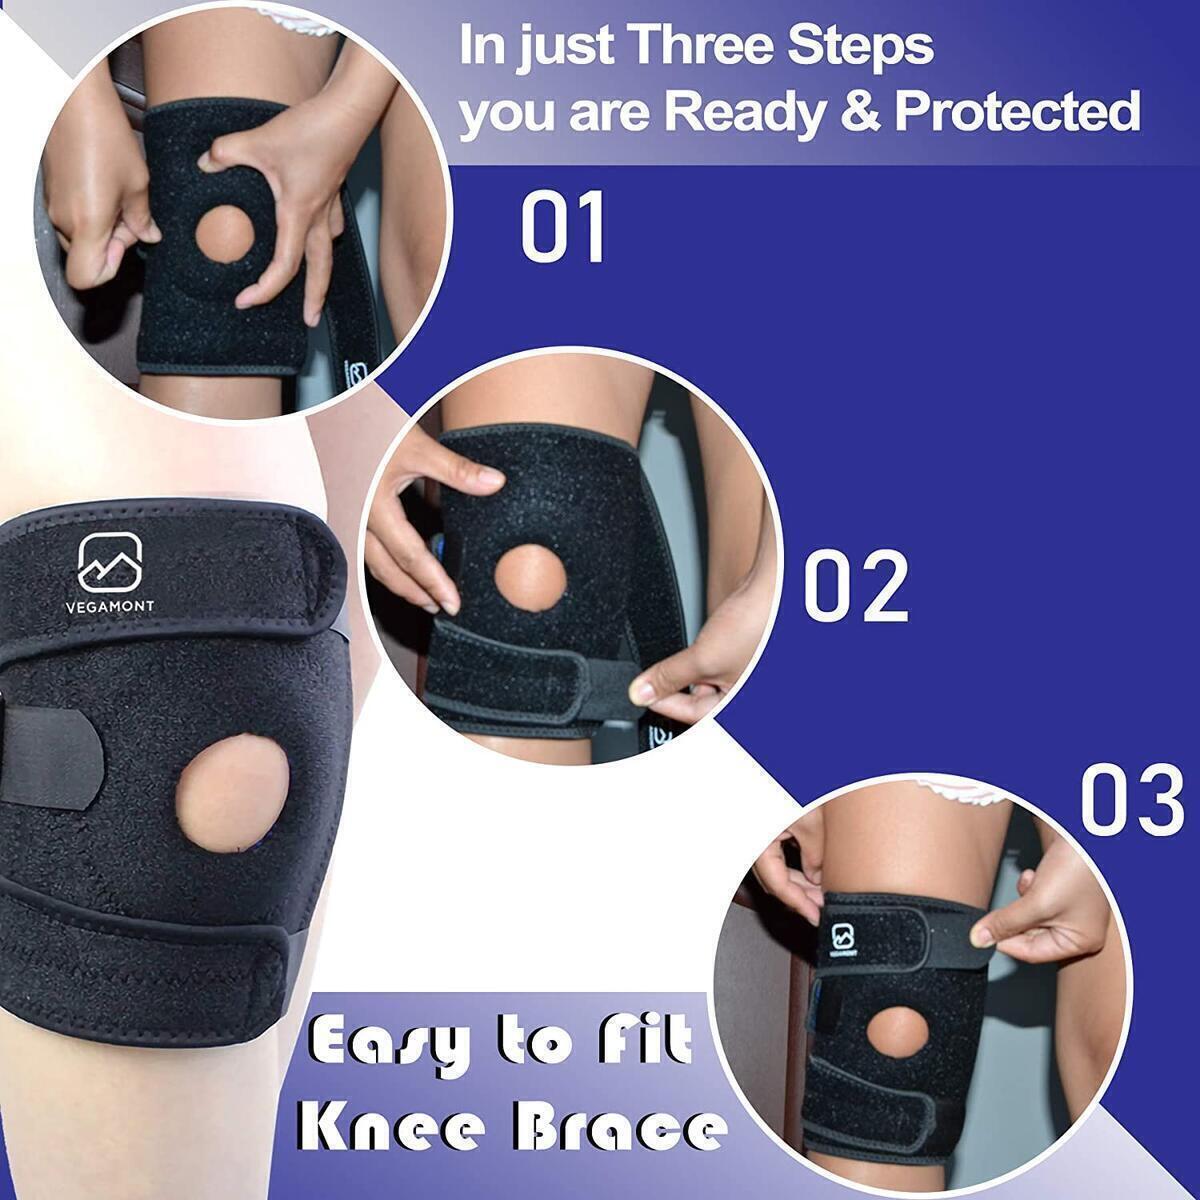 VEGAMONT Knee Brace Support for Women and Men - Adjustable Open Patella Neoprene Strap- Reduce pain & Protect from Injury - Non Sl